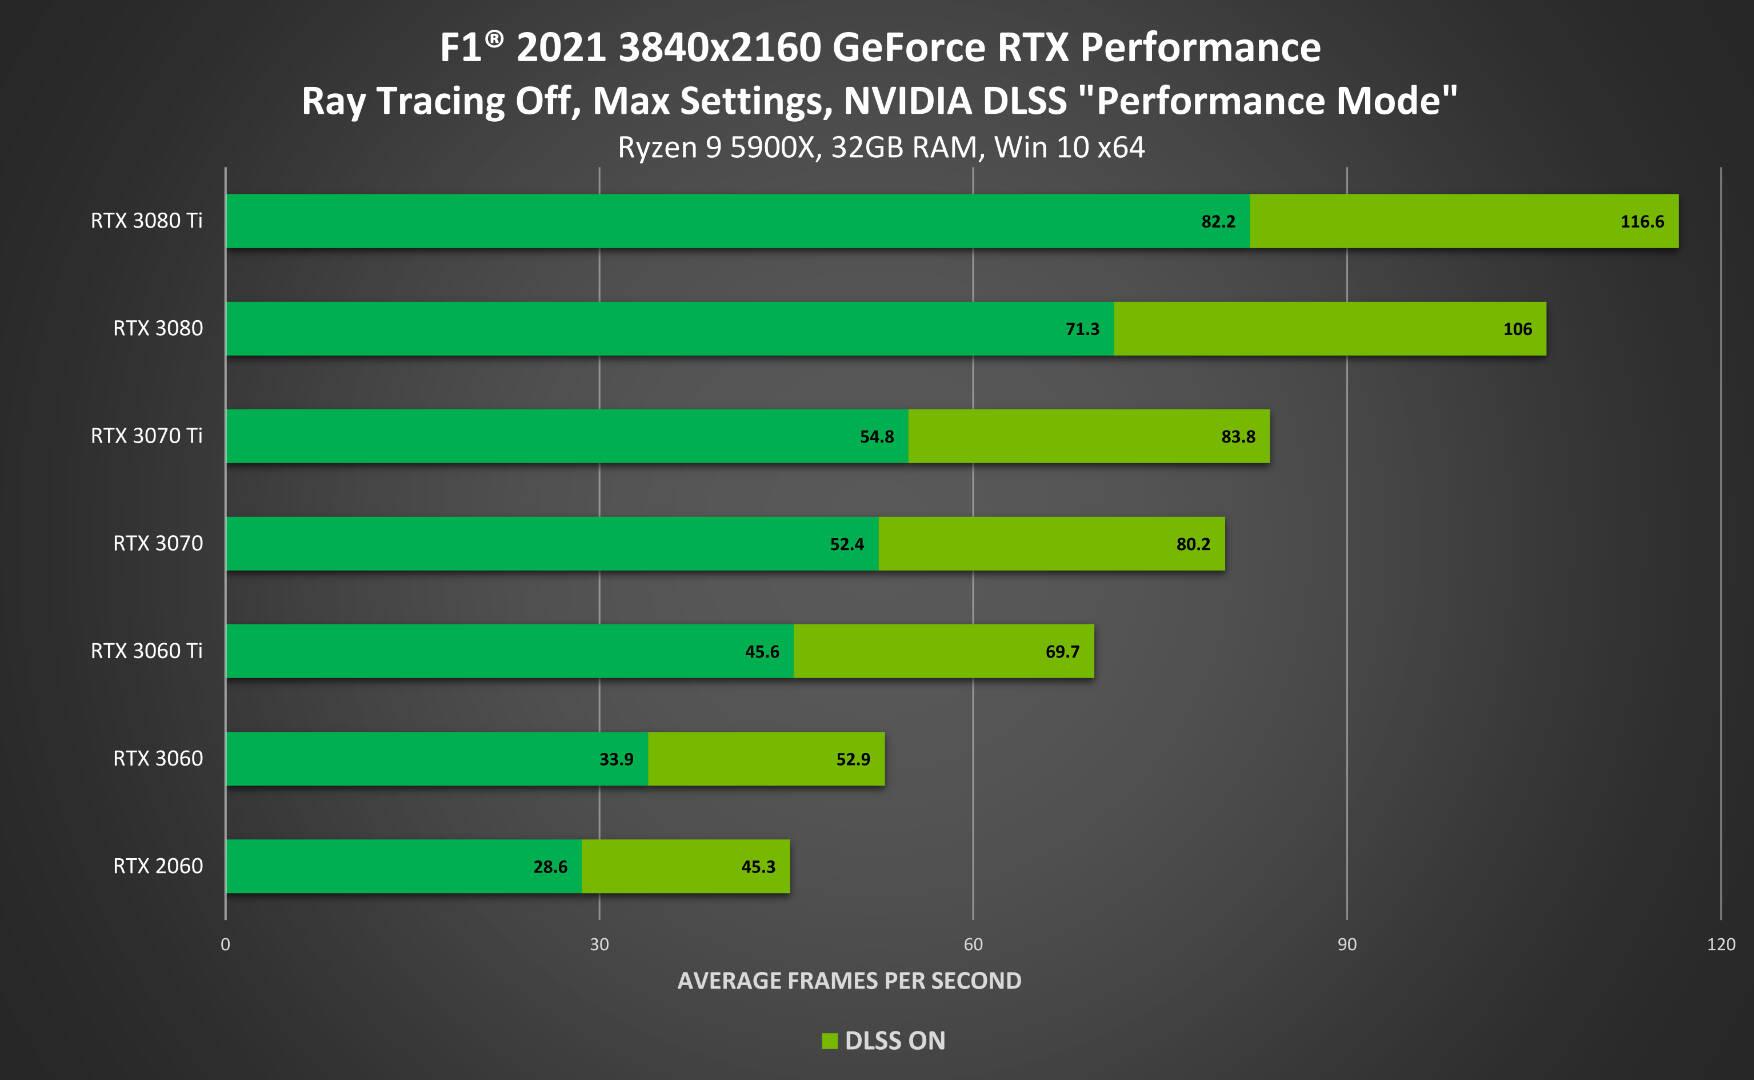 F1 2021 DLSS Performance